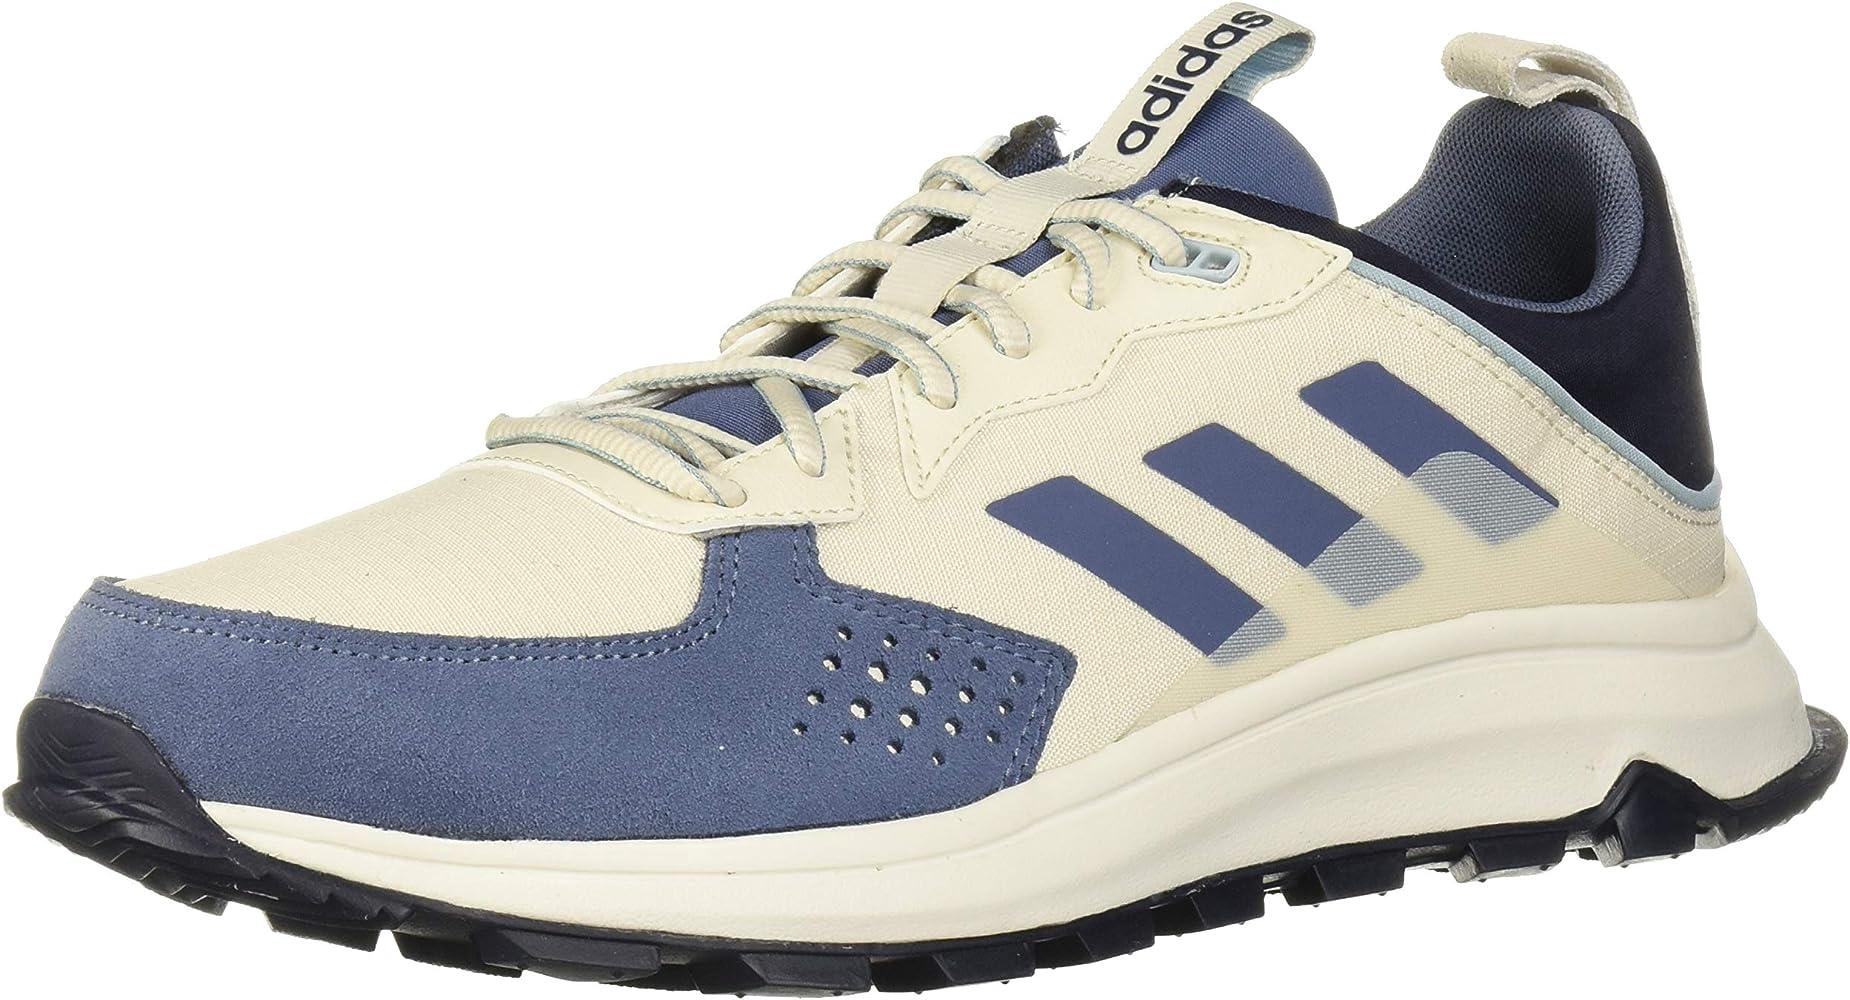 castigo tornado mano  Amazon.com: adidas Response Trail Zapatillas para correr para hombre,  Blanco, 6.5: Shoes